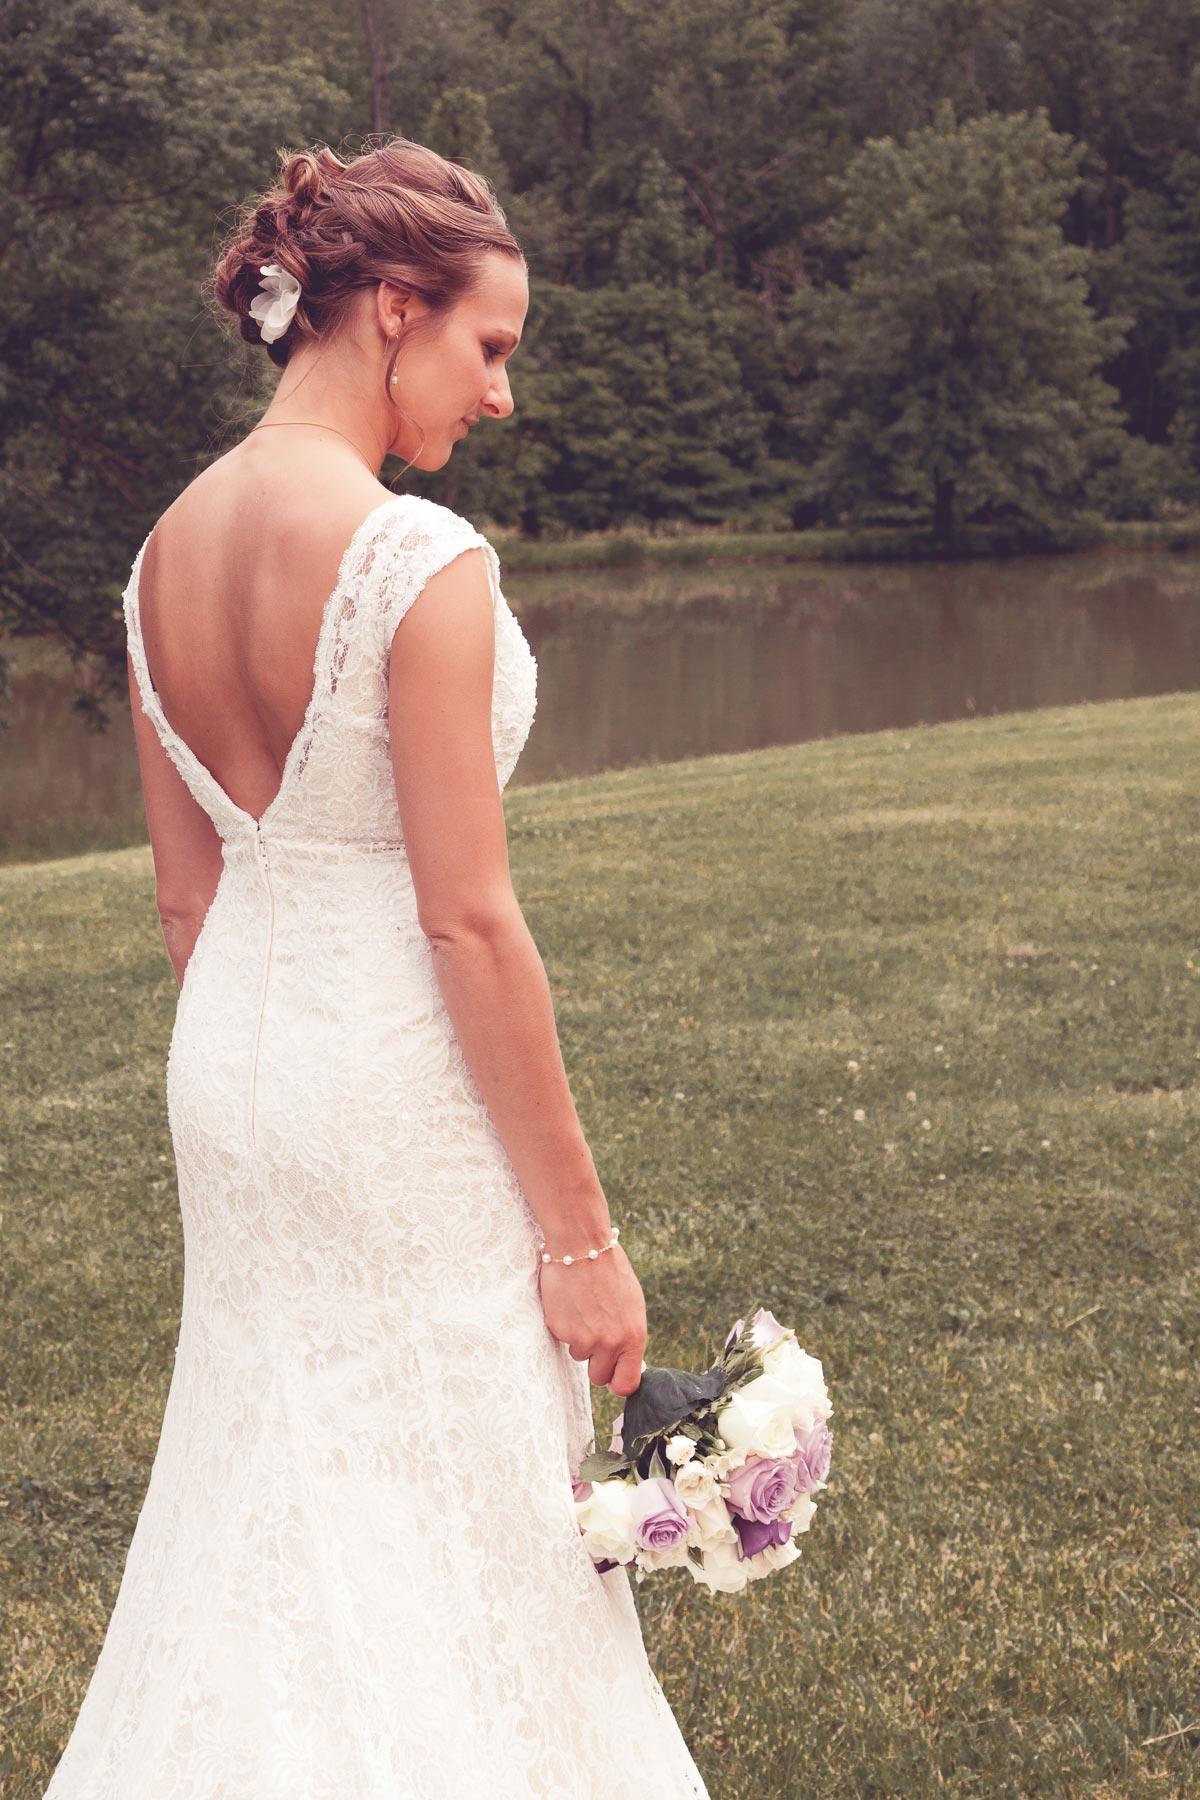 evansville-wedding-photographer-pabst-photo-kokies-echo-valley-(48)